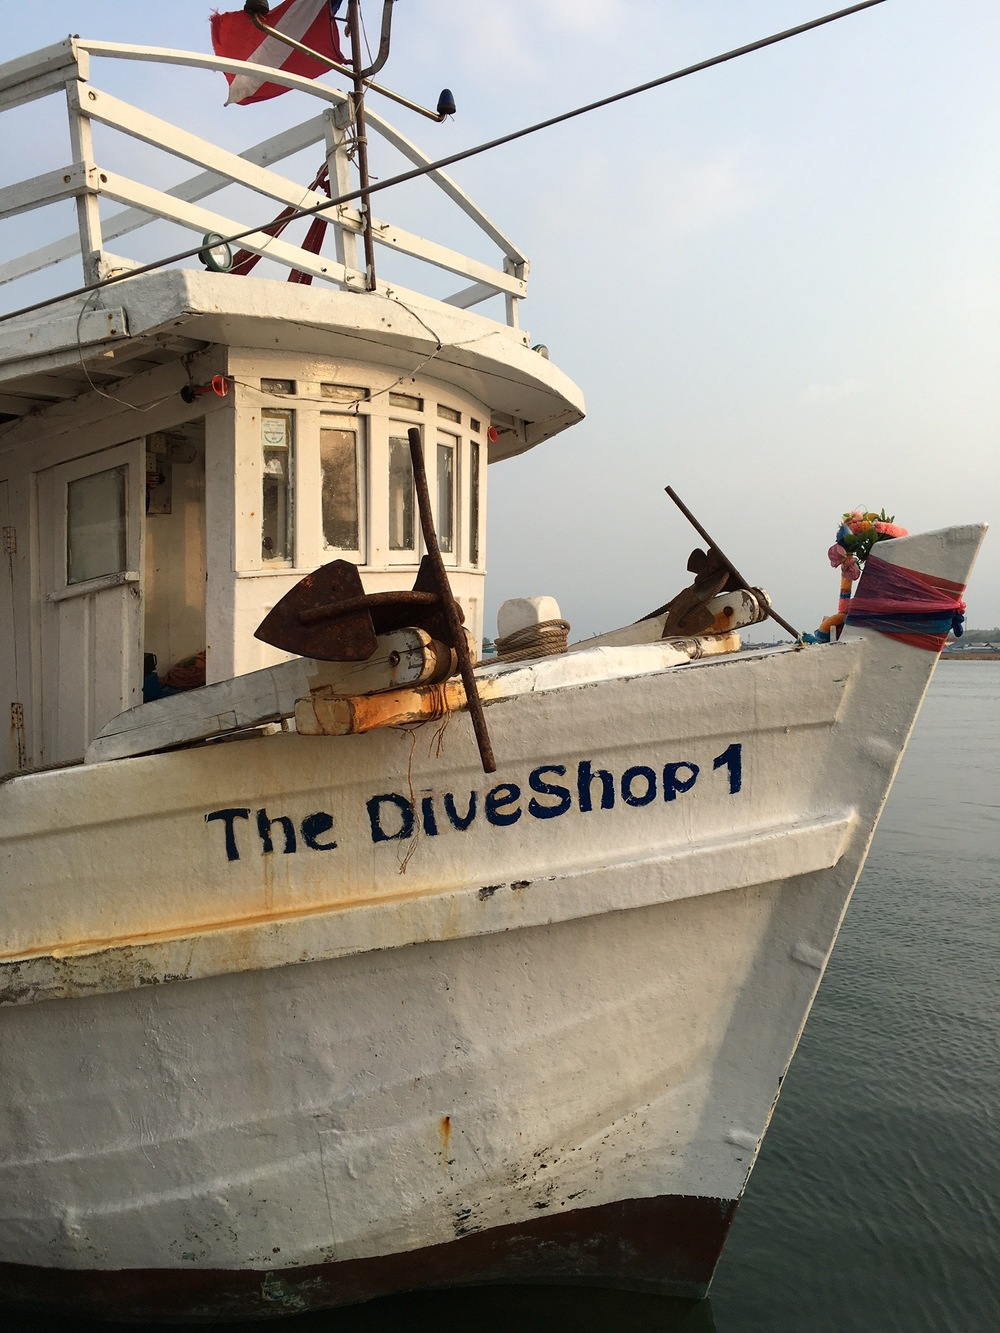 The Dive Shop boat